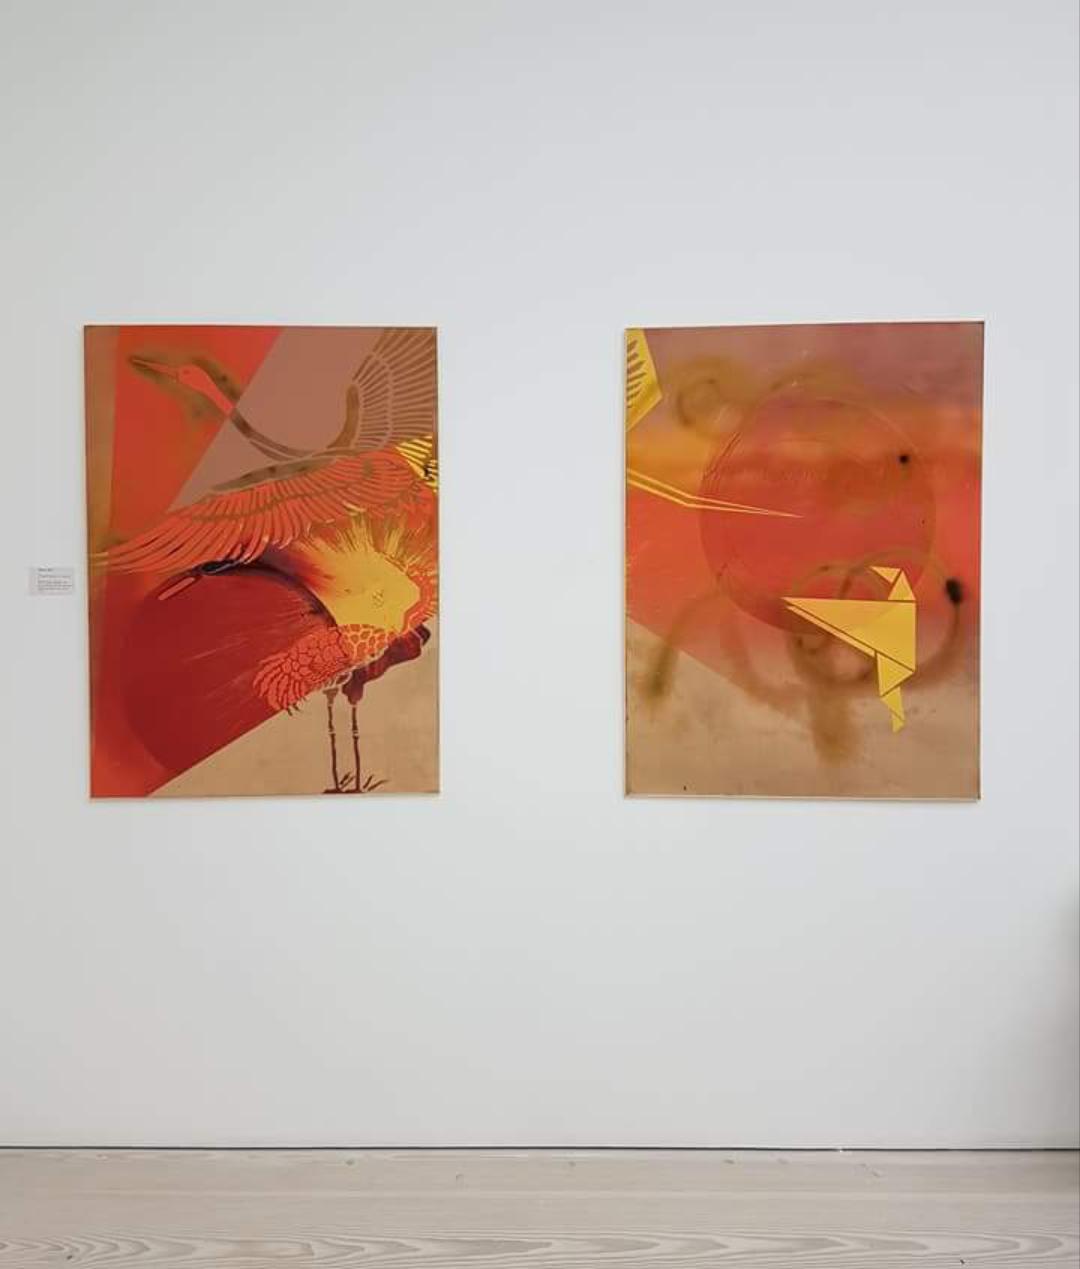 Kirigami Sunset hanging up at the Saatchi Gallery, London. September 2017